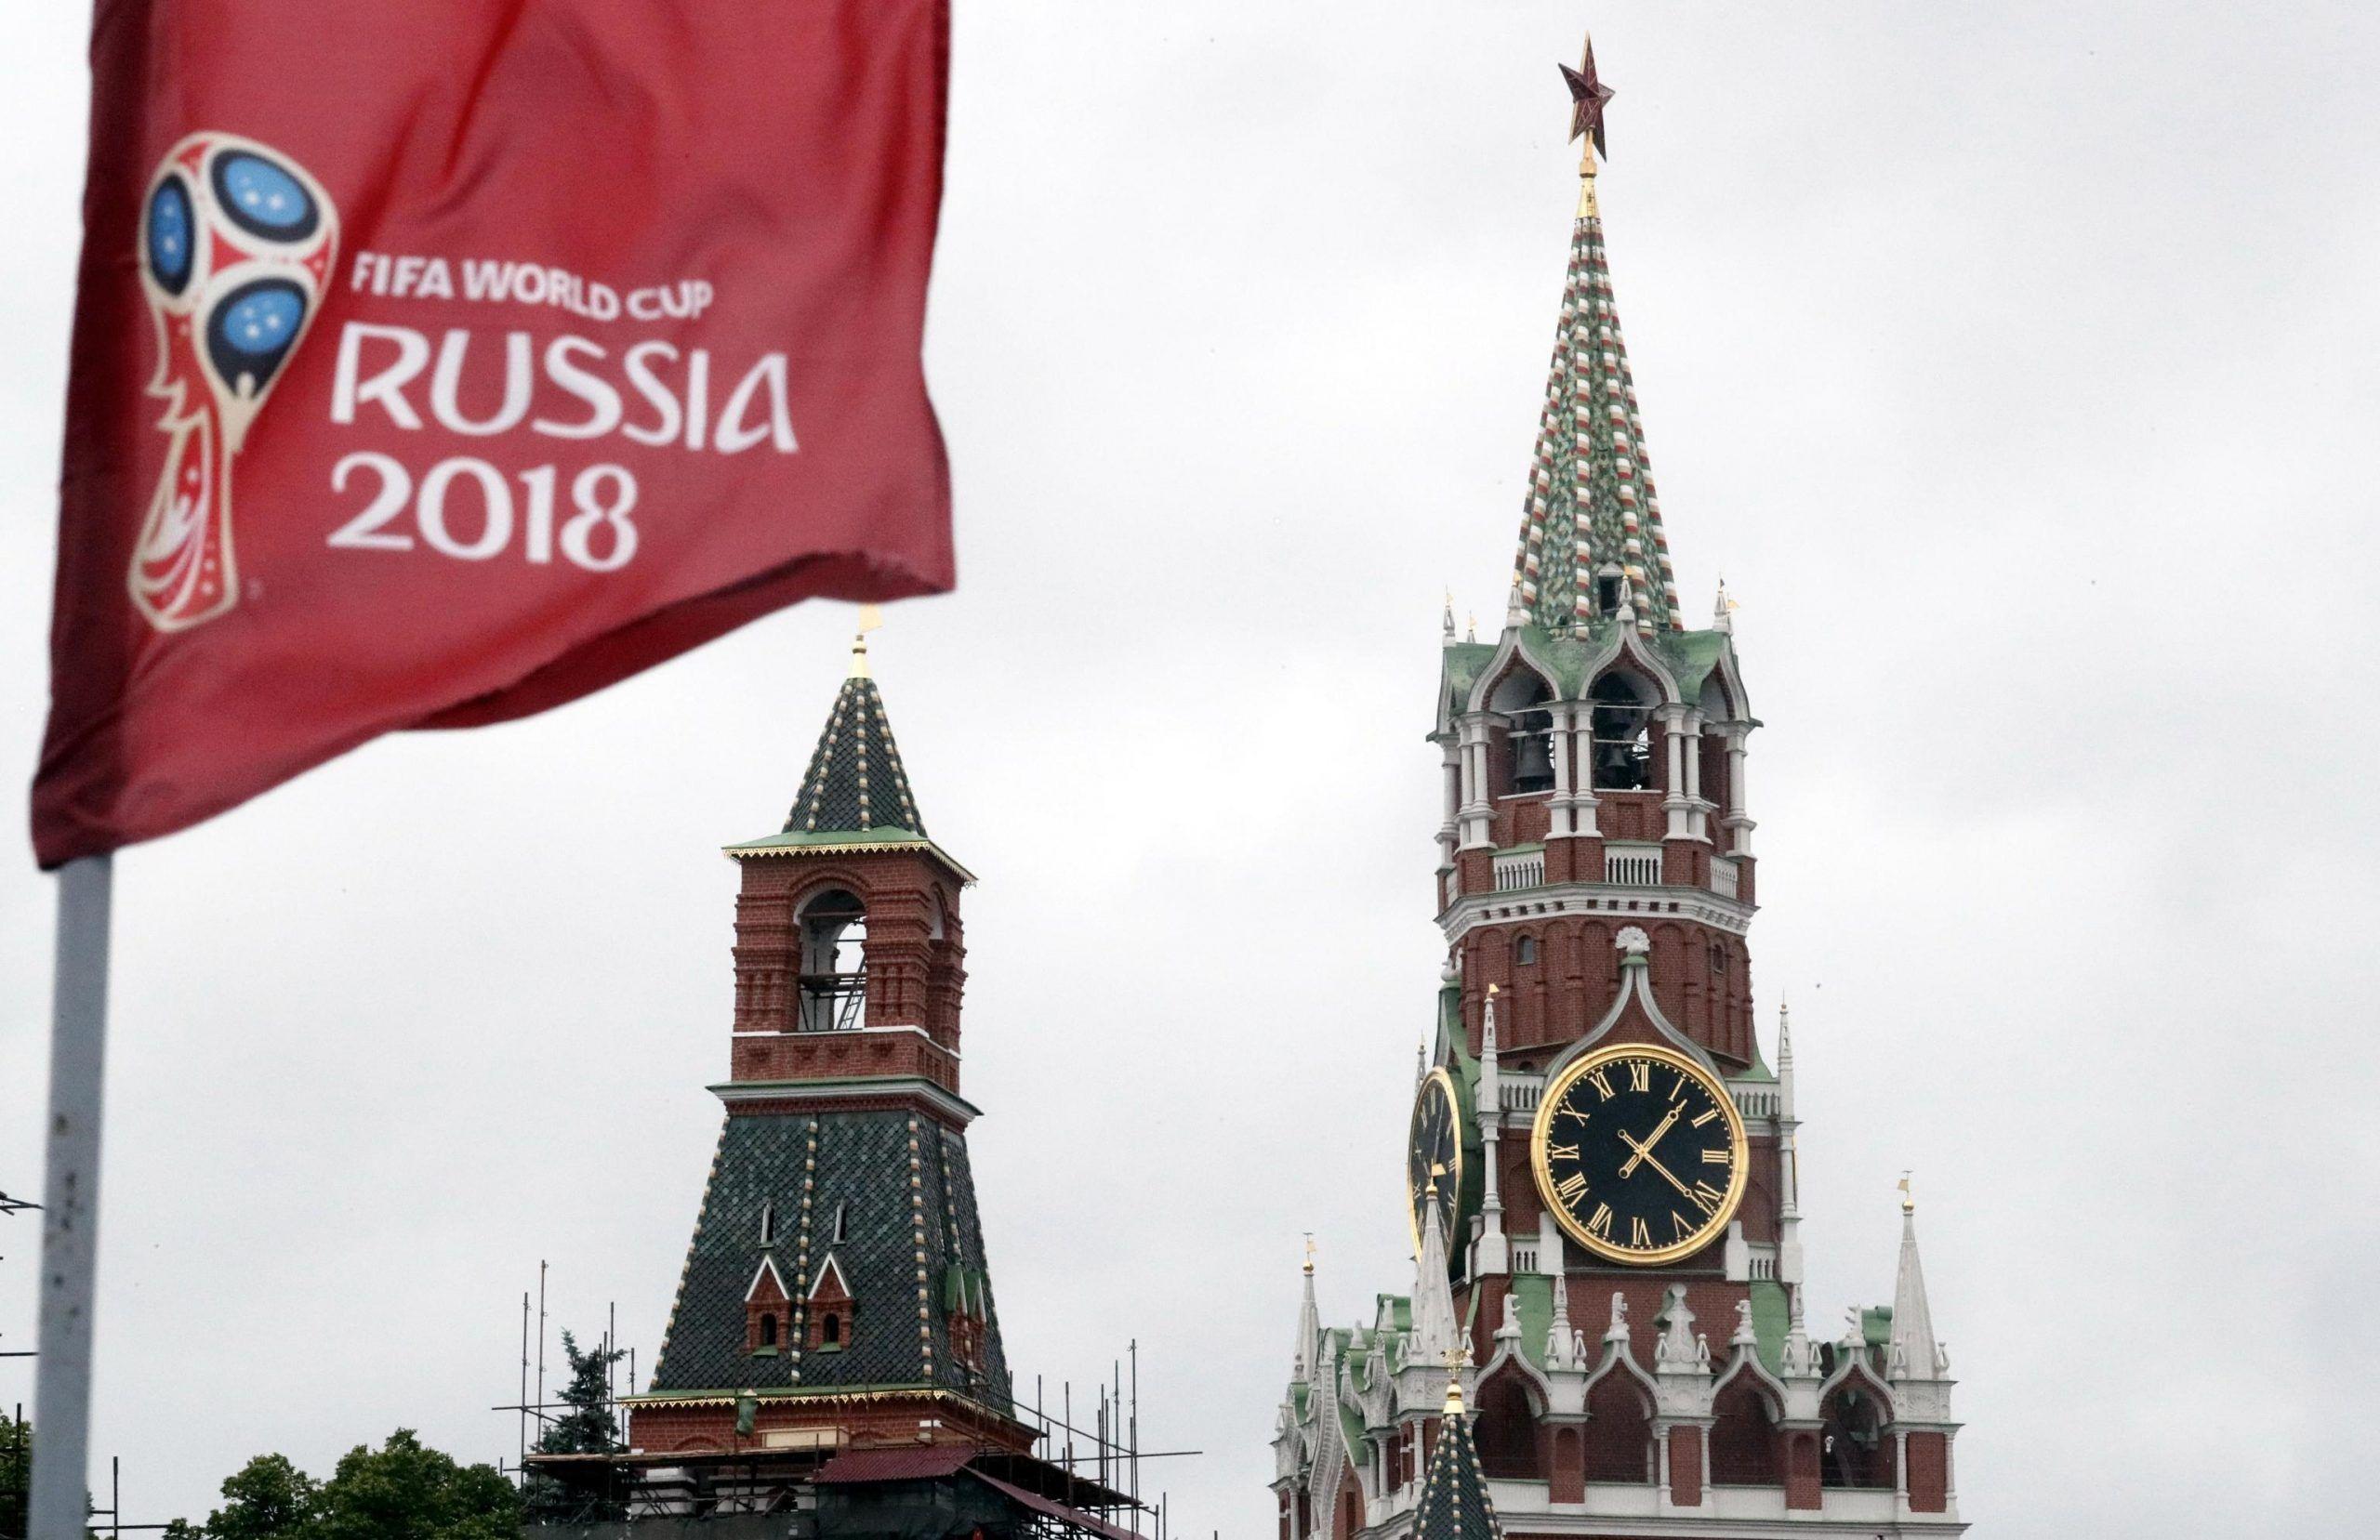 FIFA World Cup 2018 preparation